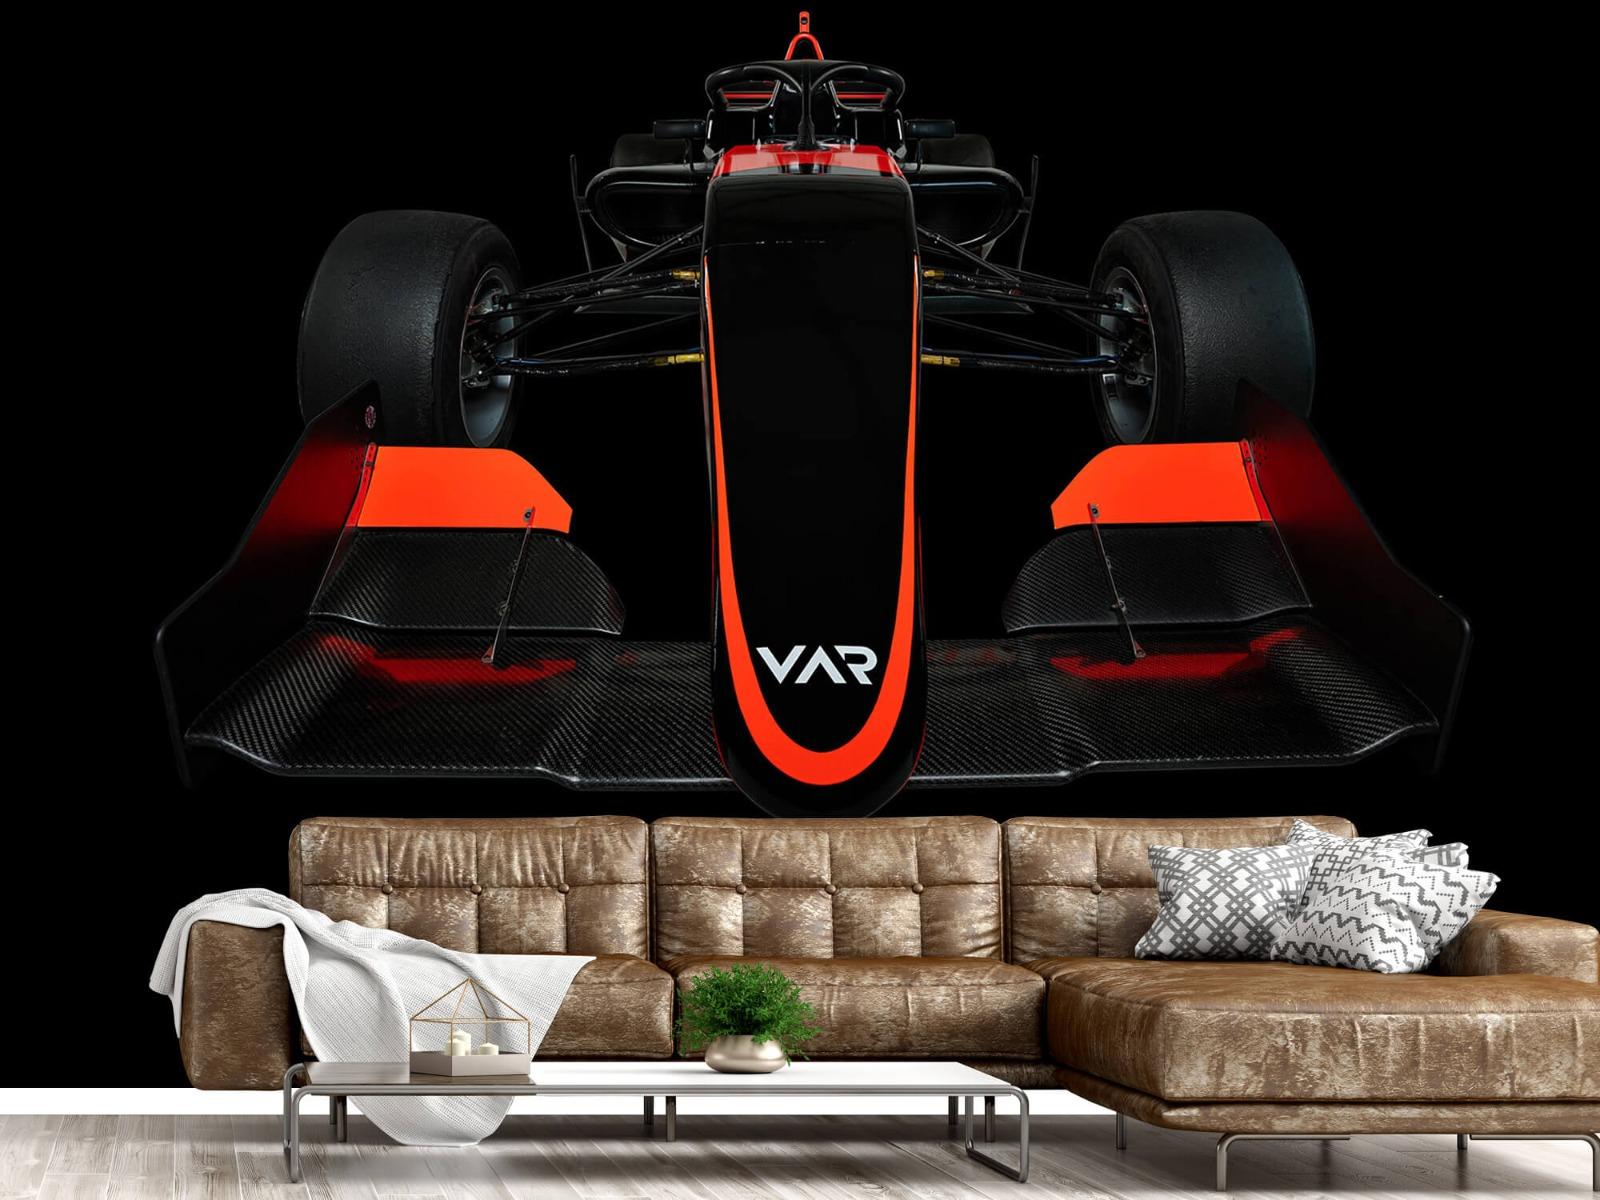 Sportauto's - Formule 3 - Lower front view - dark - Slaapkamer 15